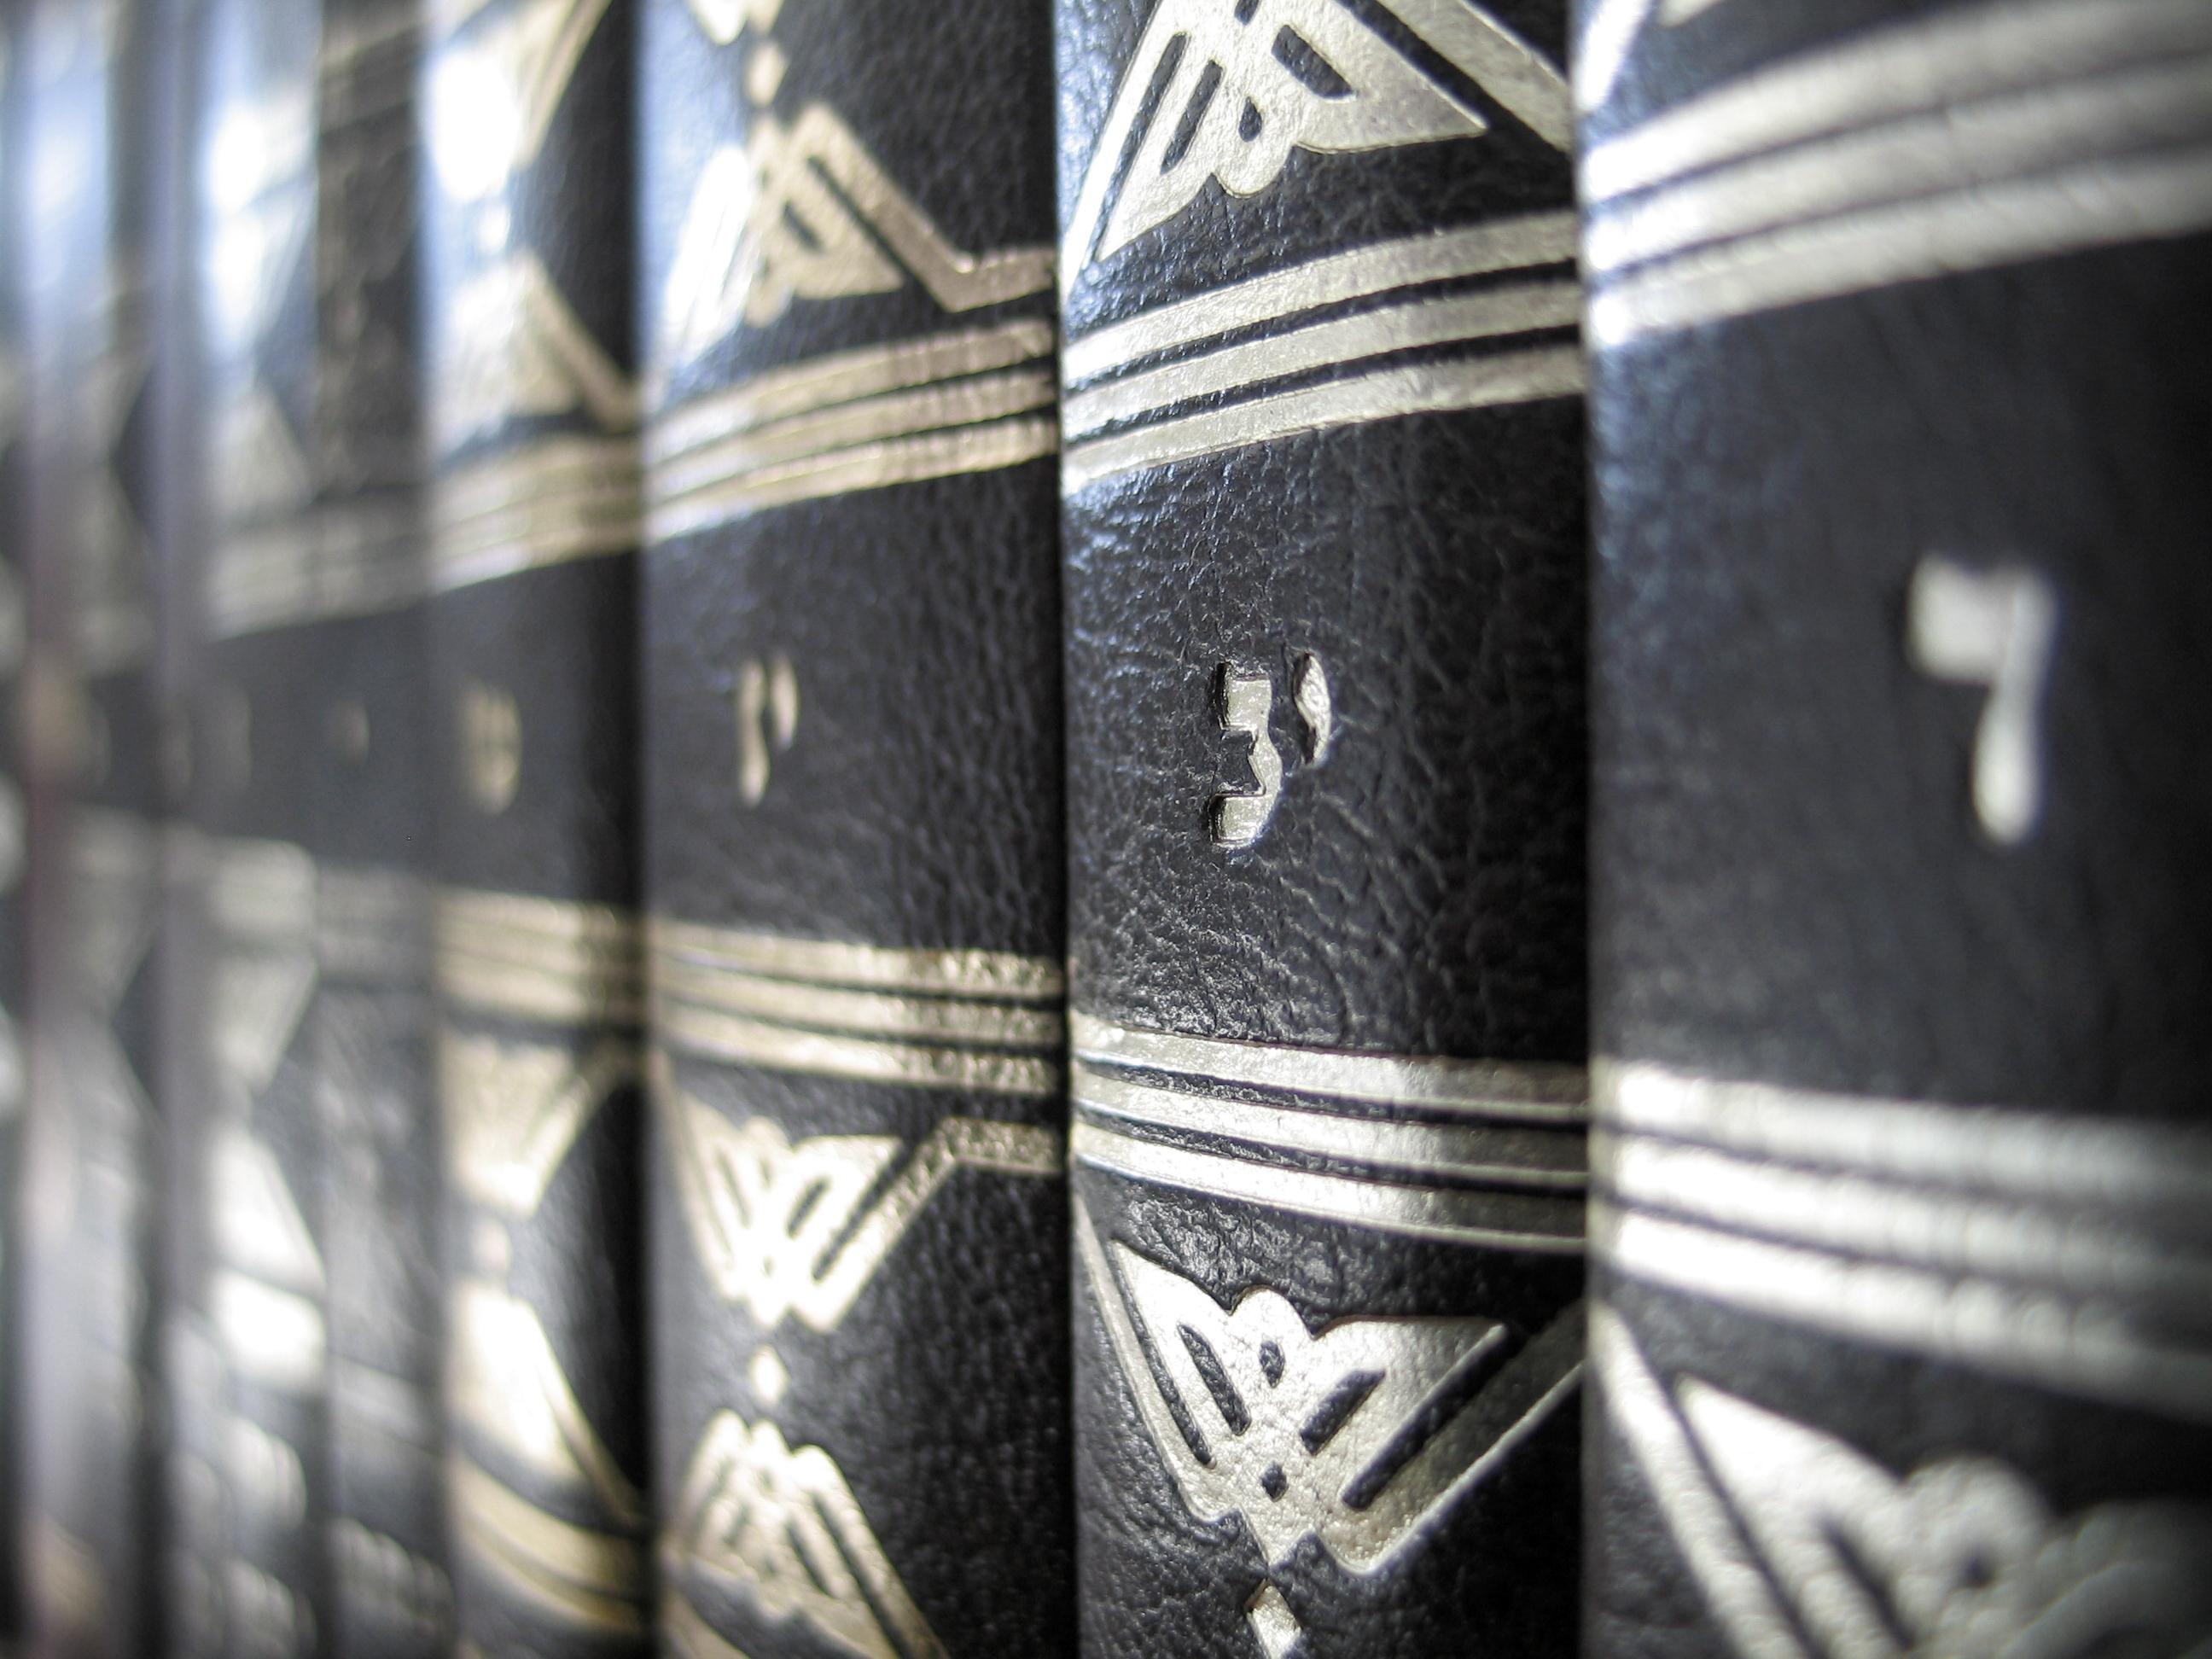 Sacred Texts | ReformJudaism.org